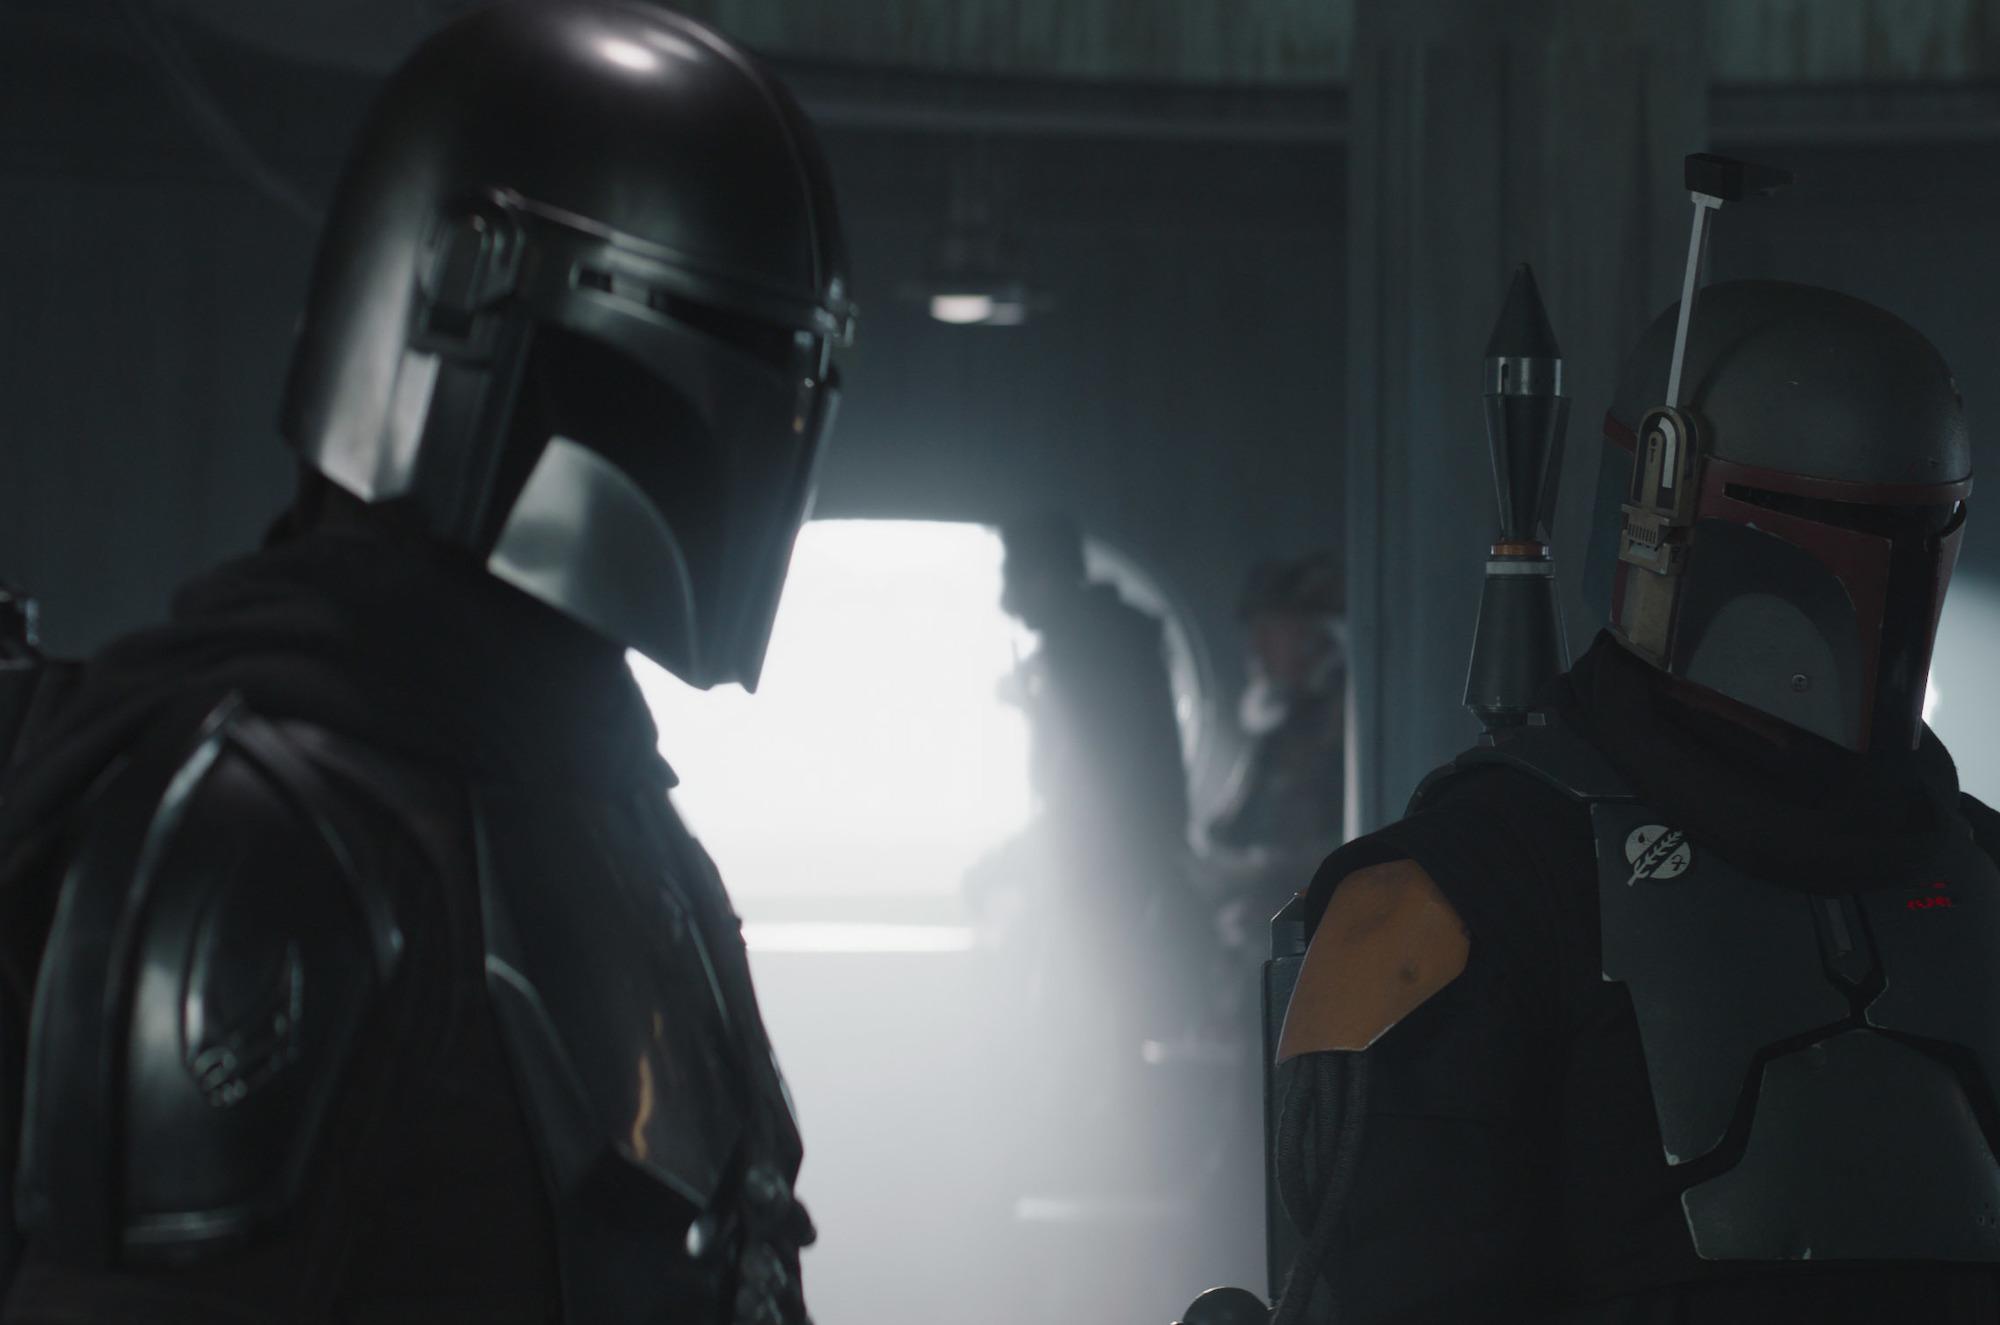 Mando and Boba Fett in 'The Mandalorian' Season 2 finale.